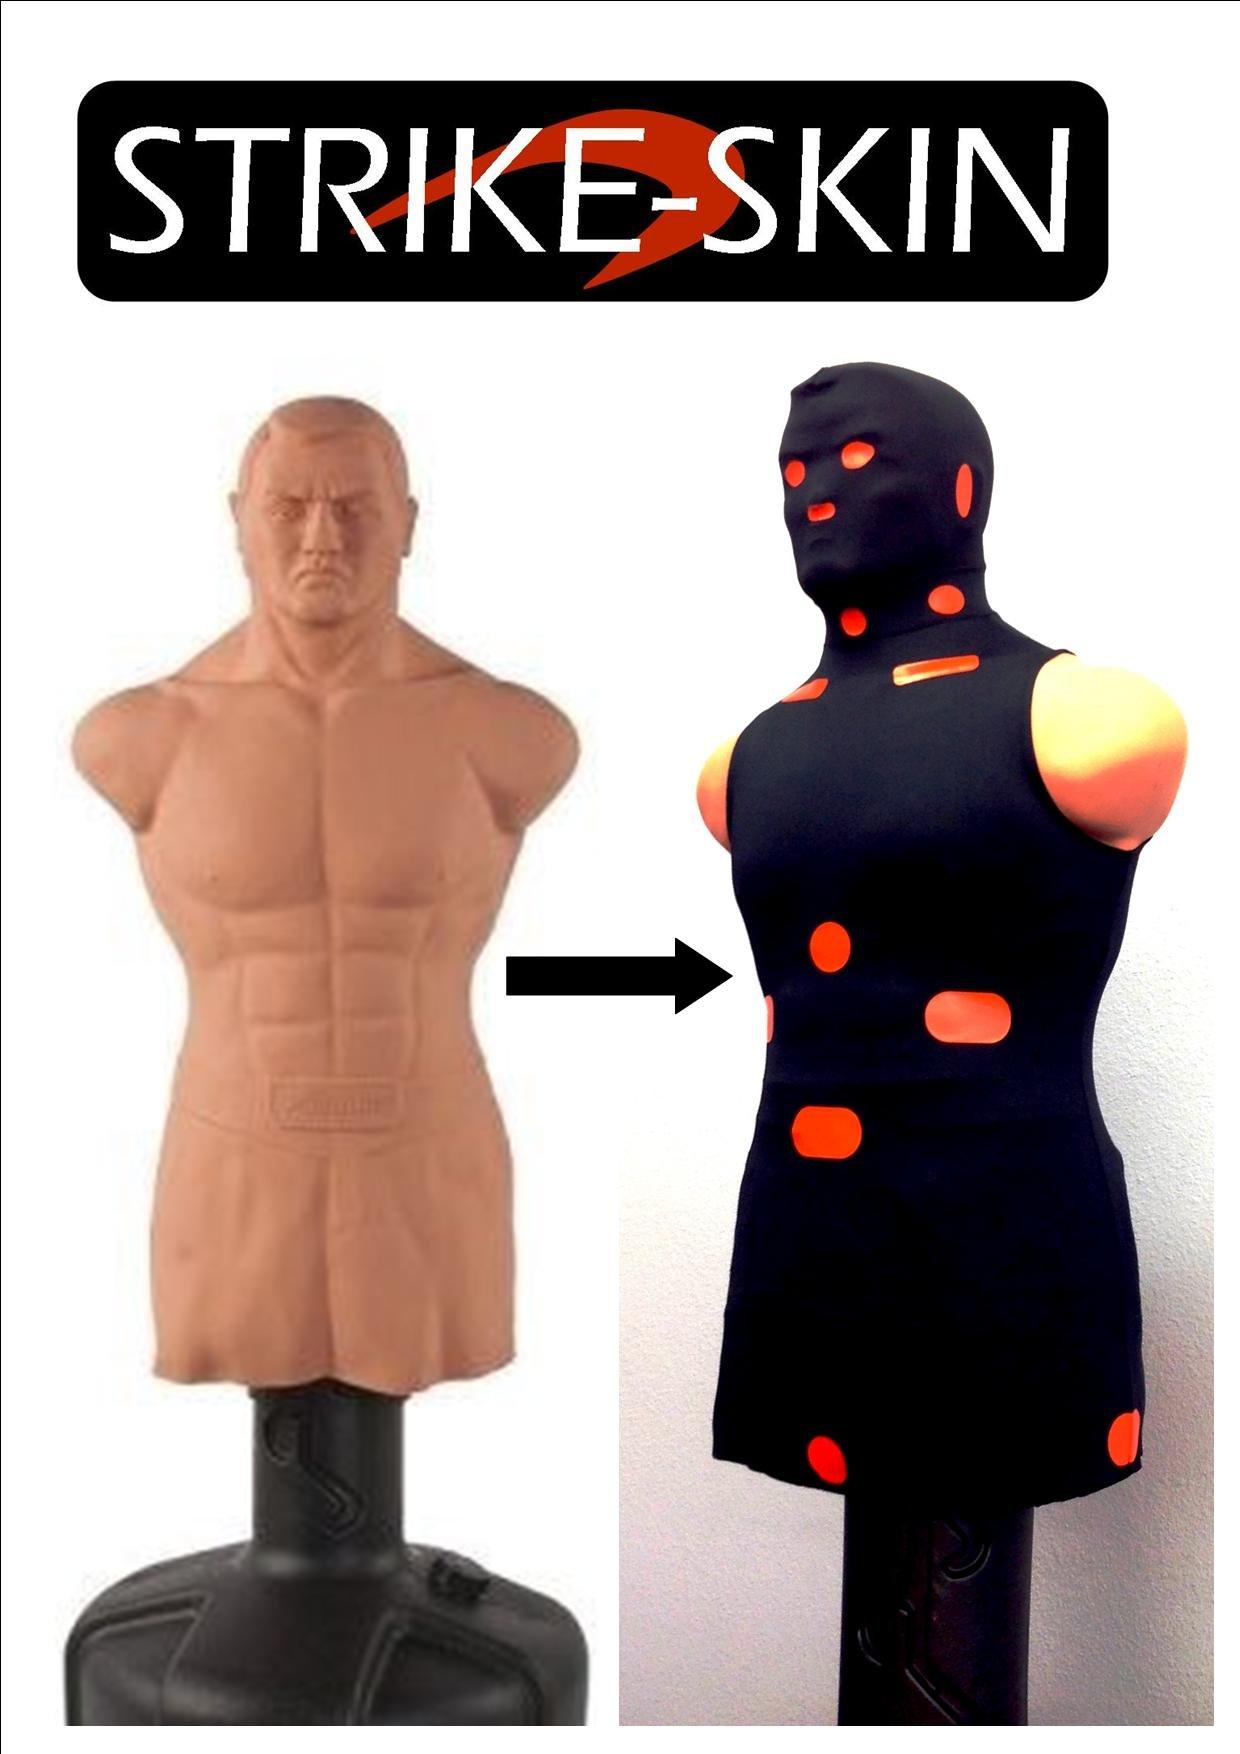 Strike-Skin Self Defense Training Aide ***BOB Punching Bag NOT Included by Strike-Skin (Image #1)